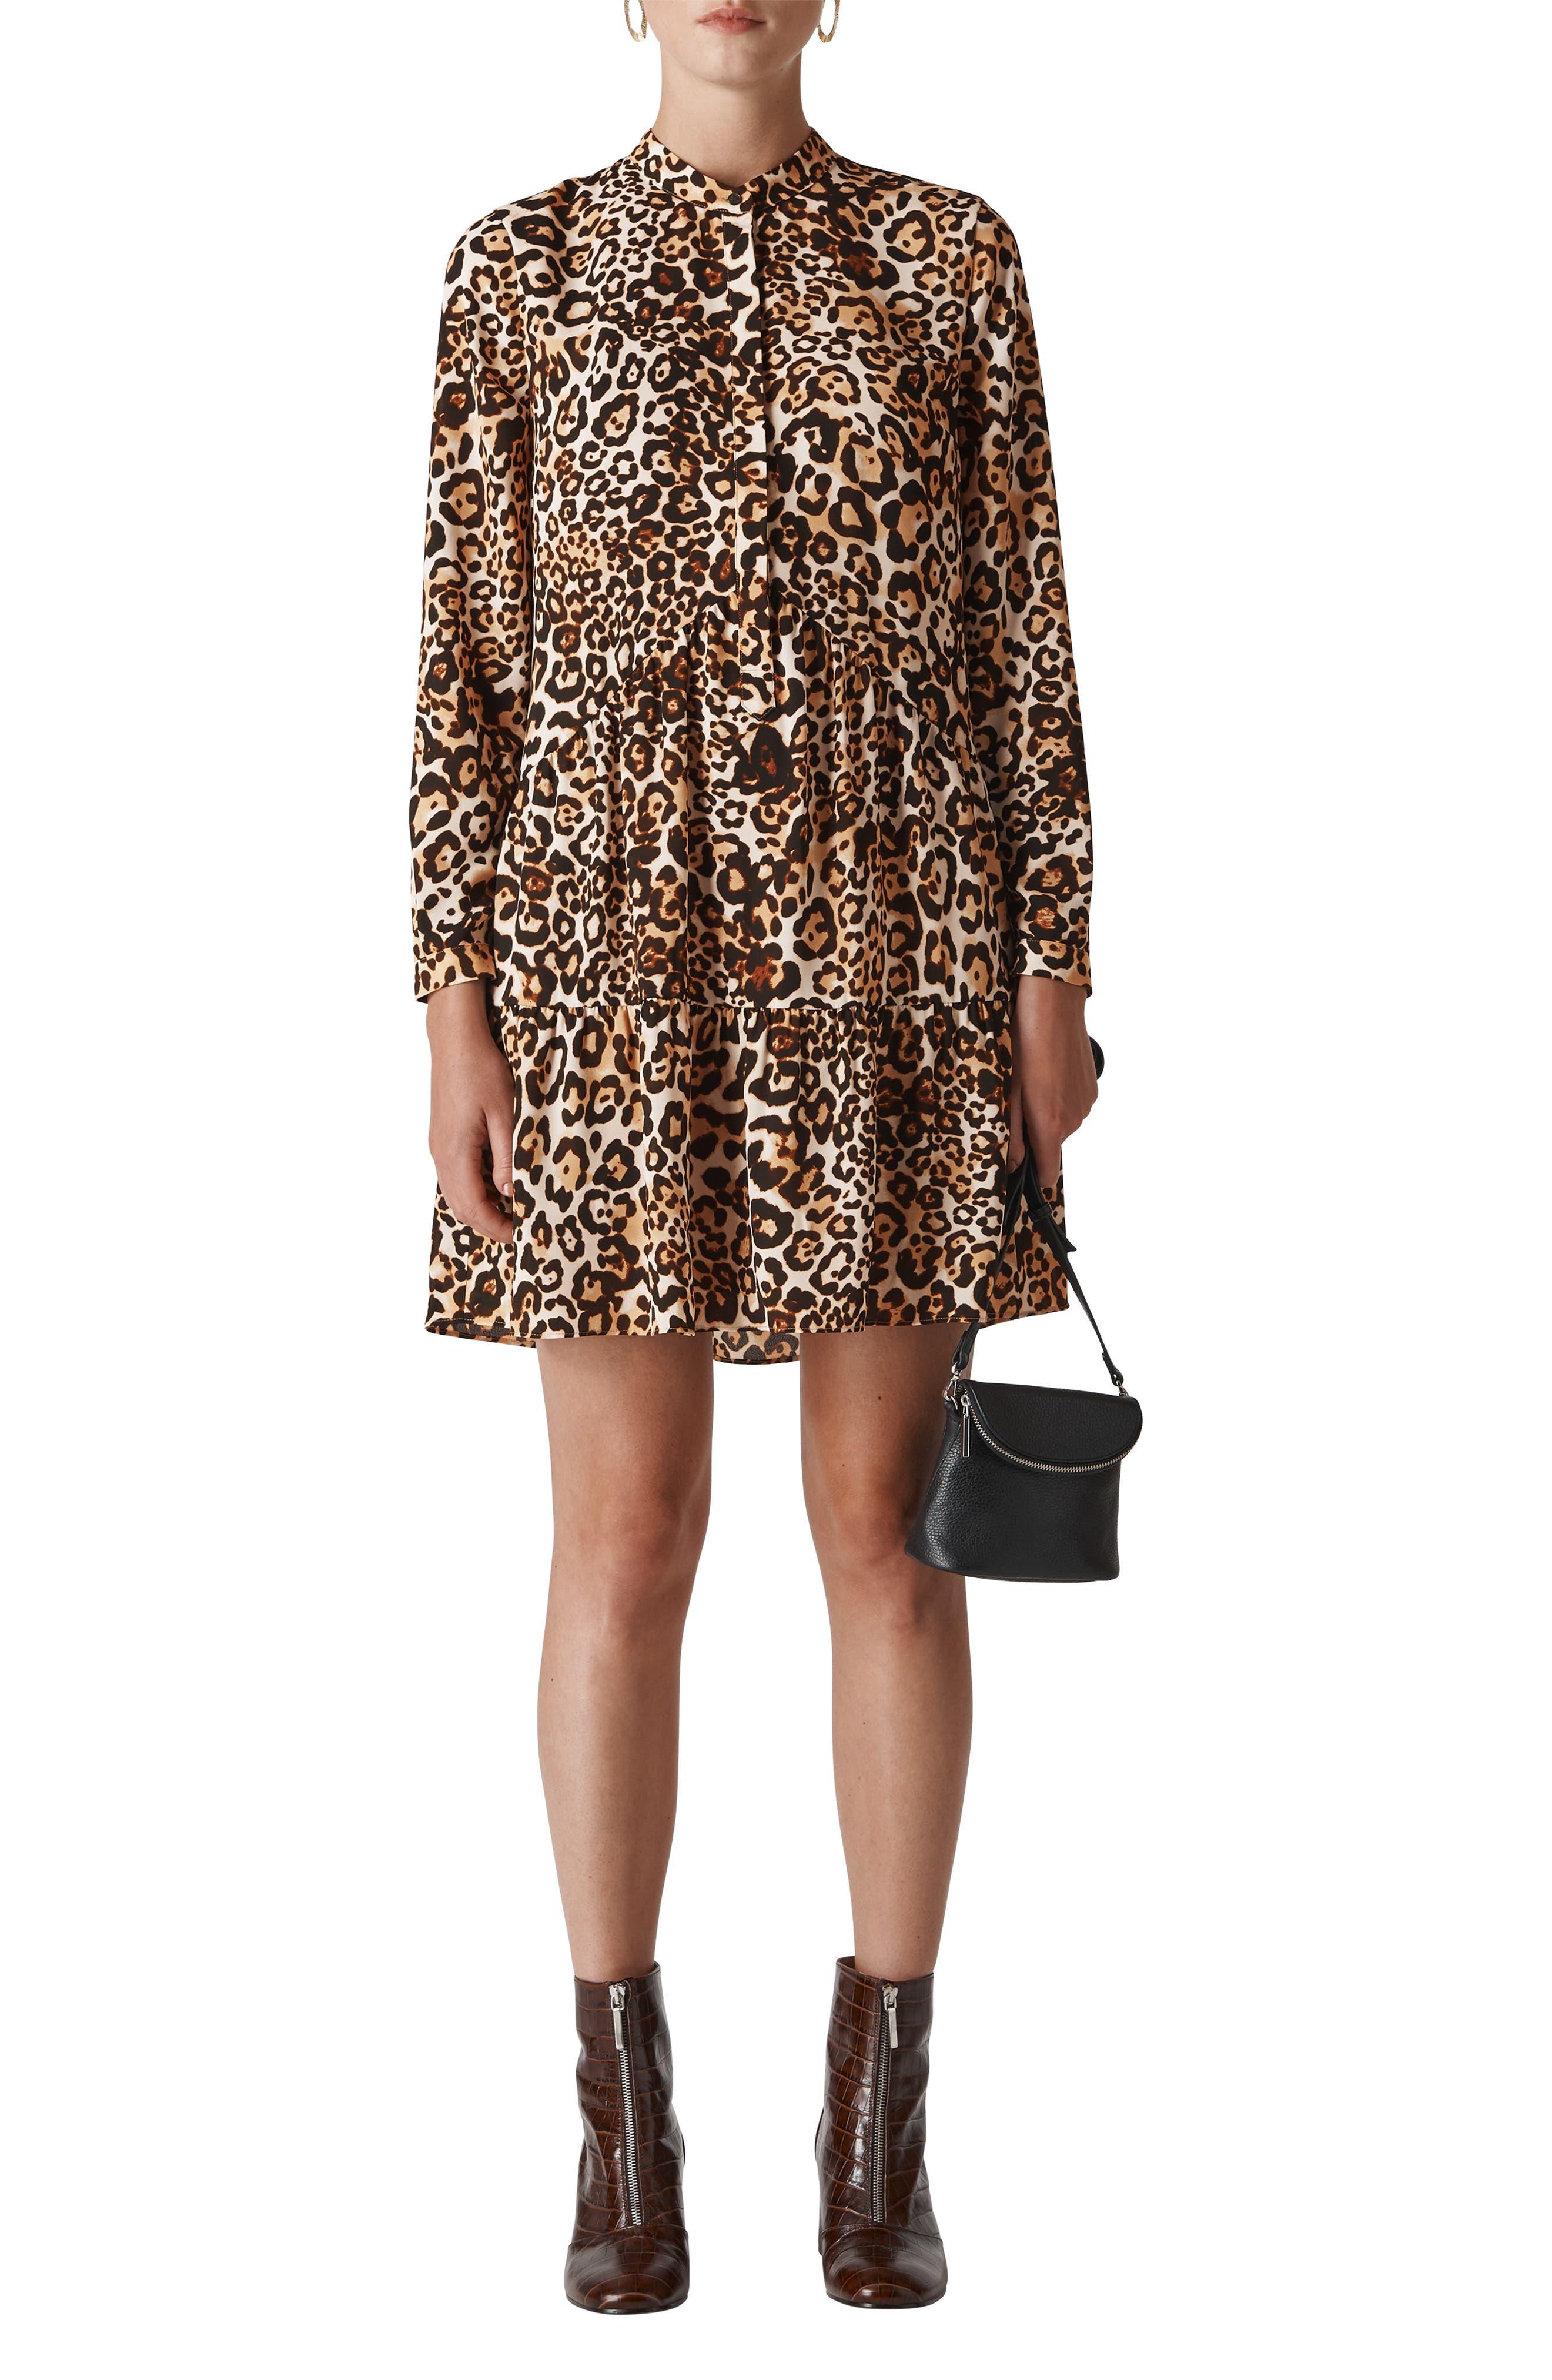 Leopard Print Shirtdress,                         Main,                         color, LEOPARD PRINT